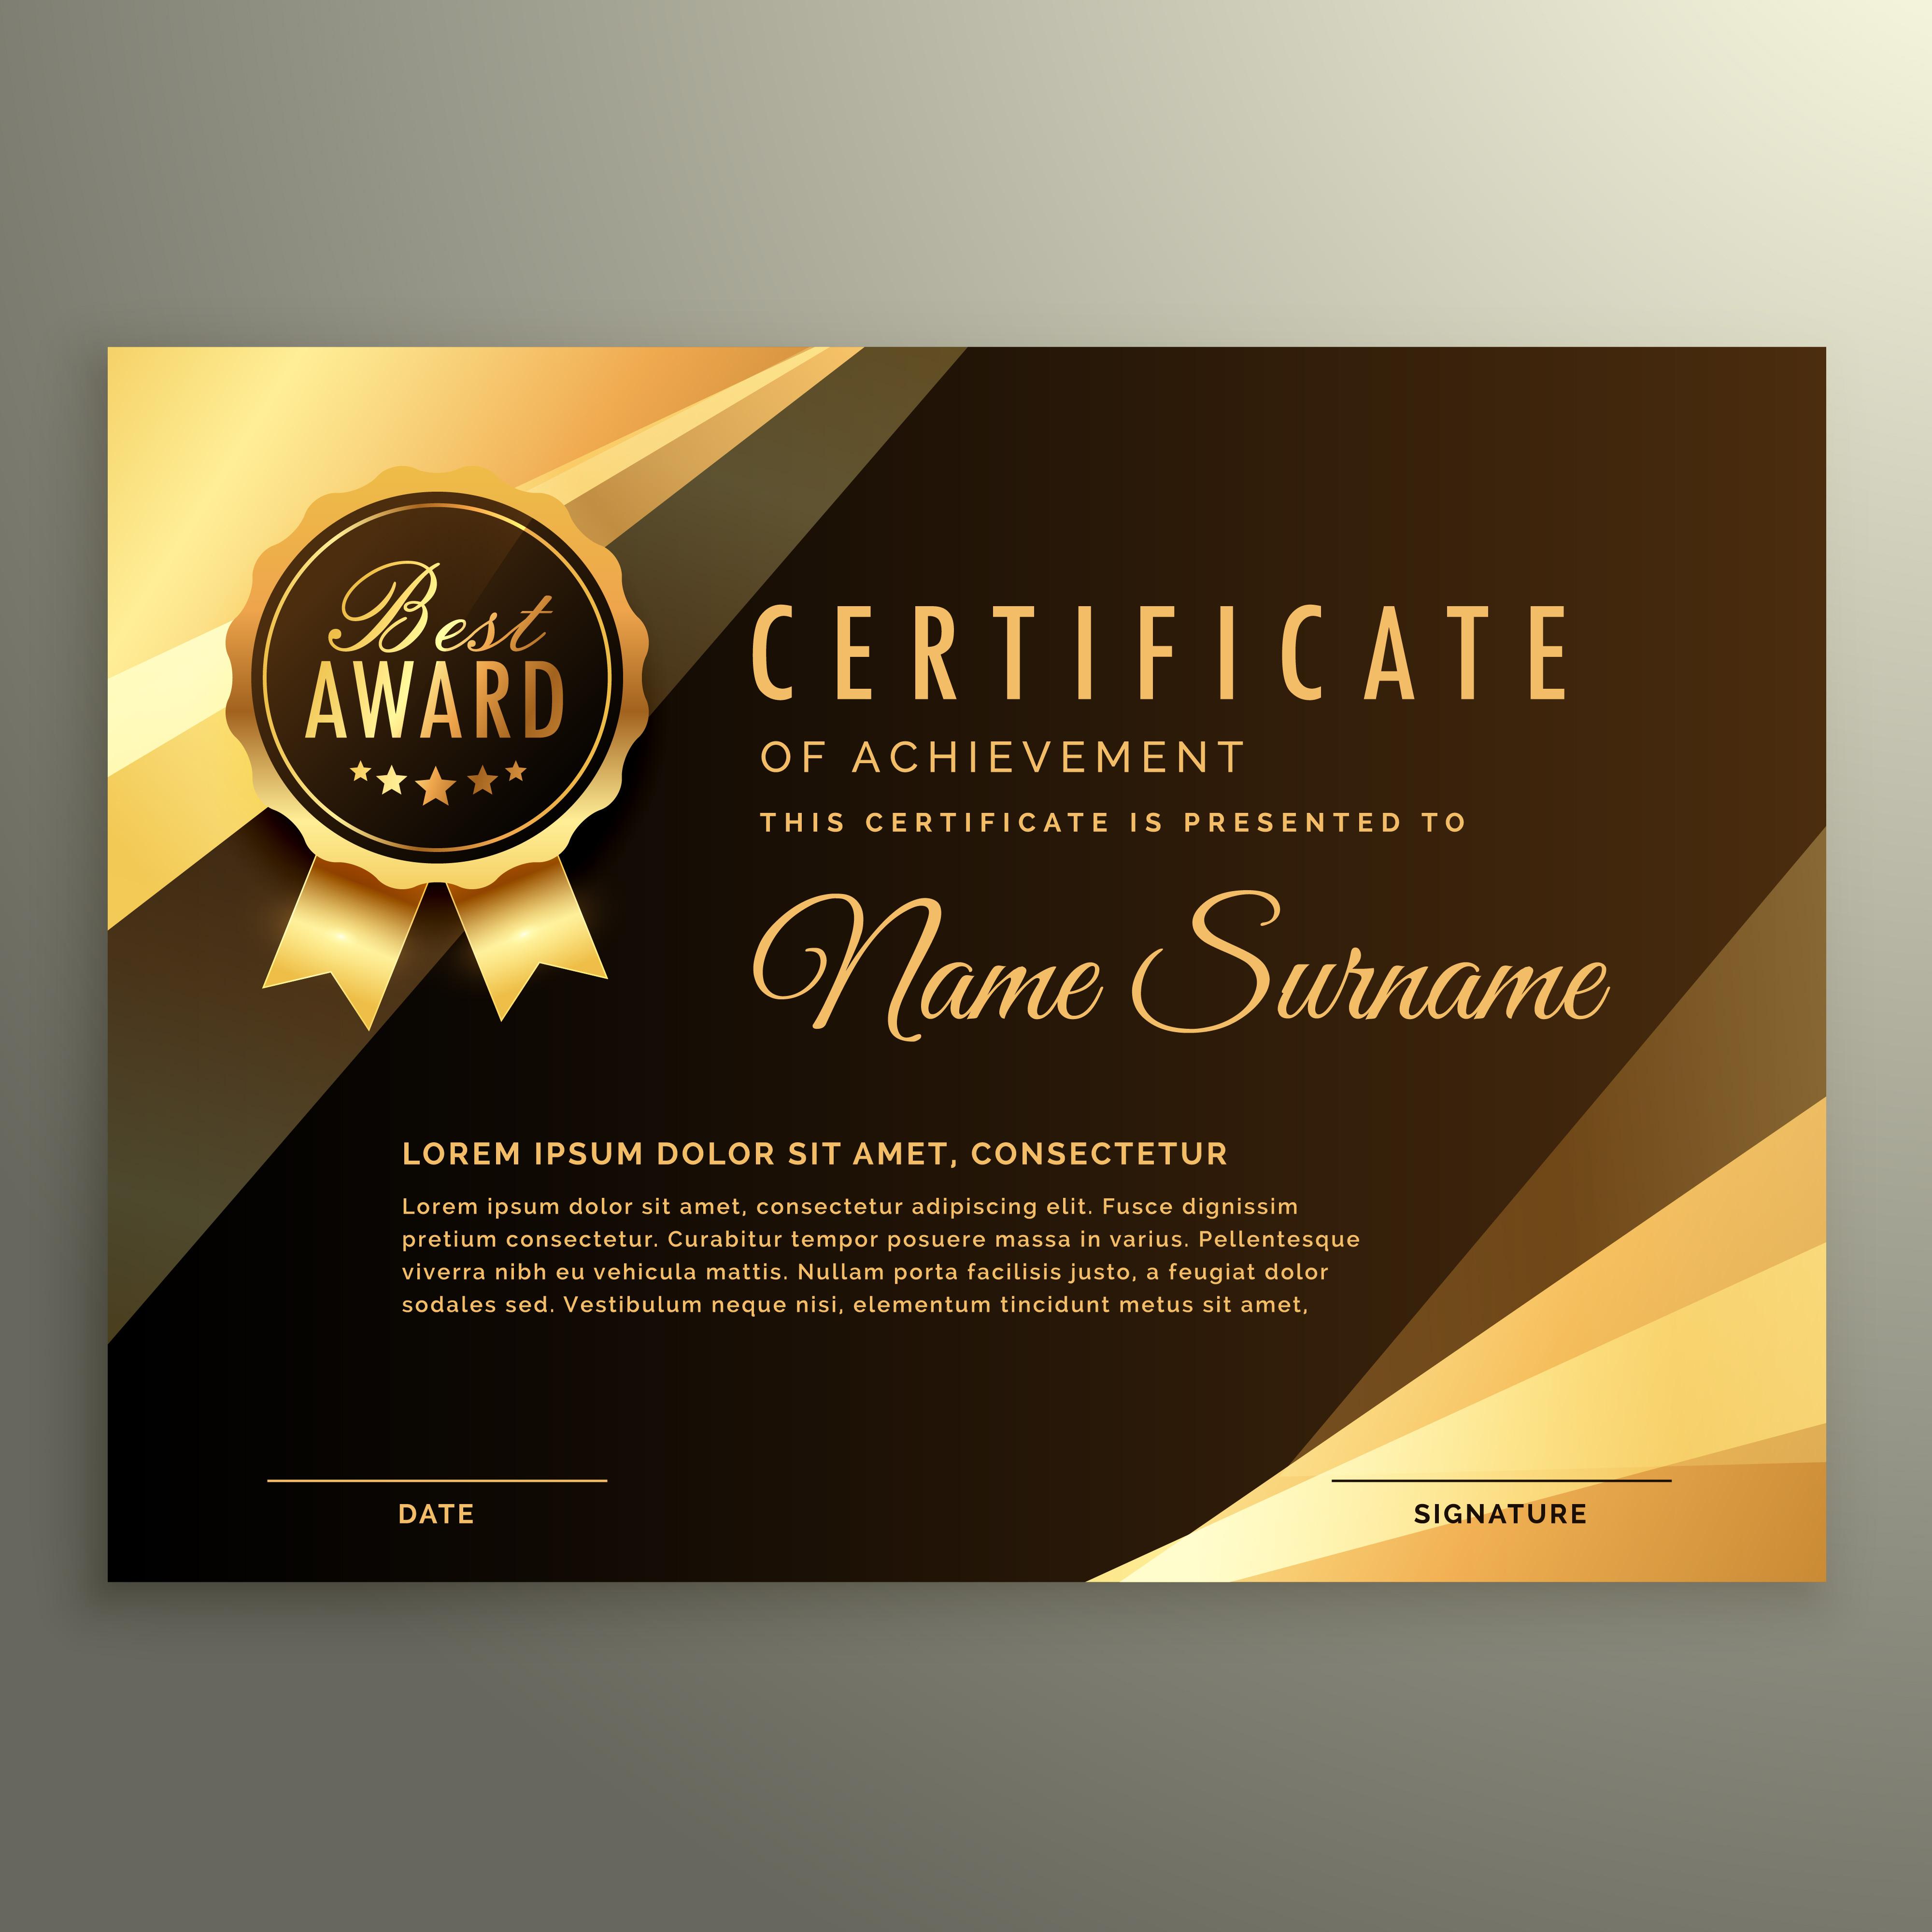 golden diploma certificate with award symbol